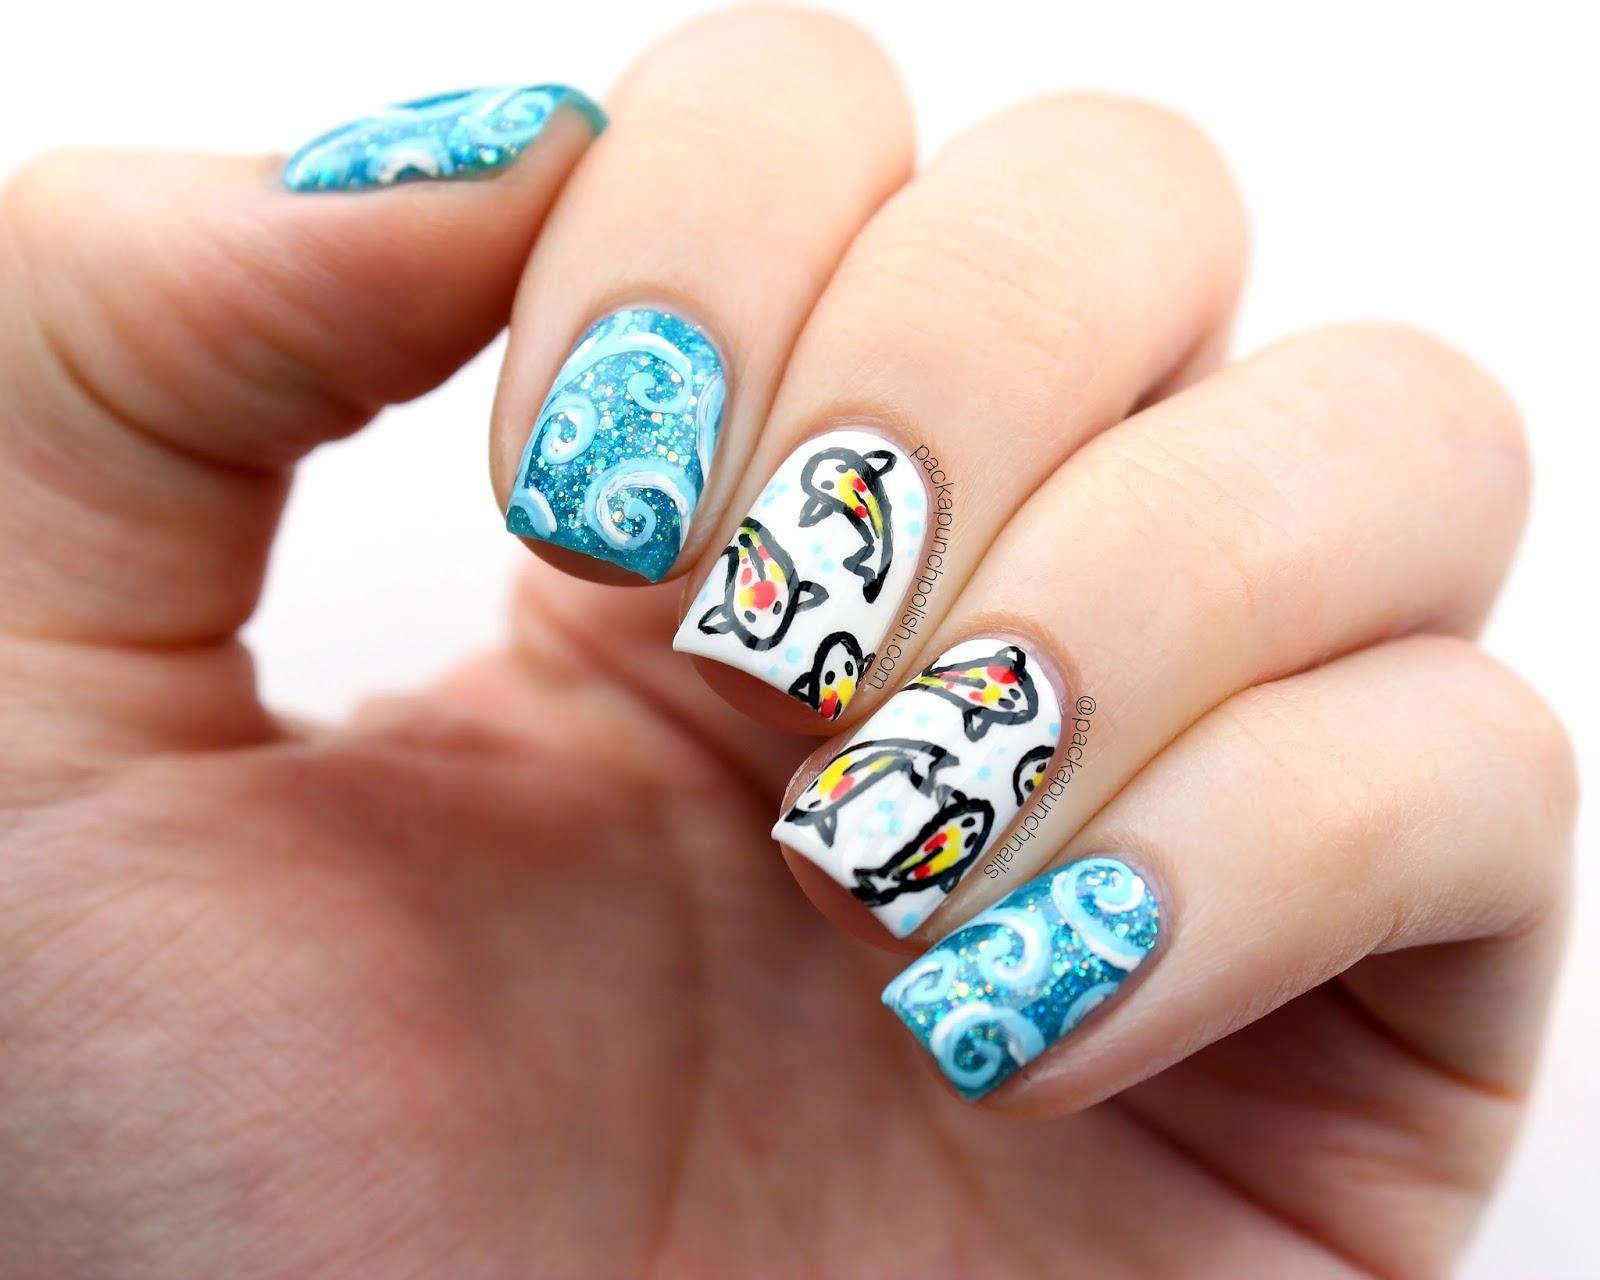 Koi Fish Nail Art - 2018 images & pictures - PlumeriaPainted Koi ...